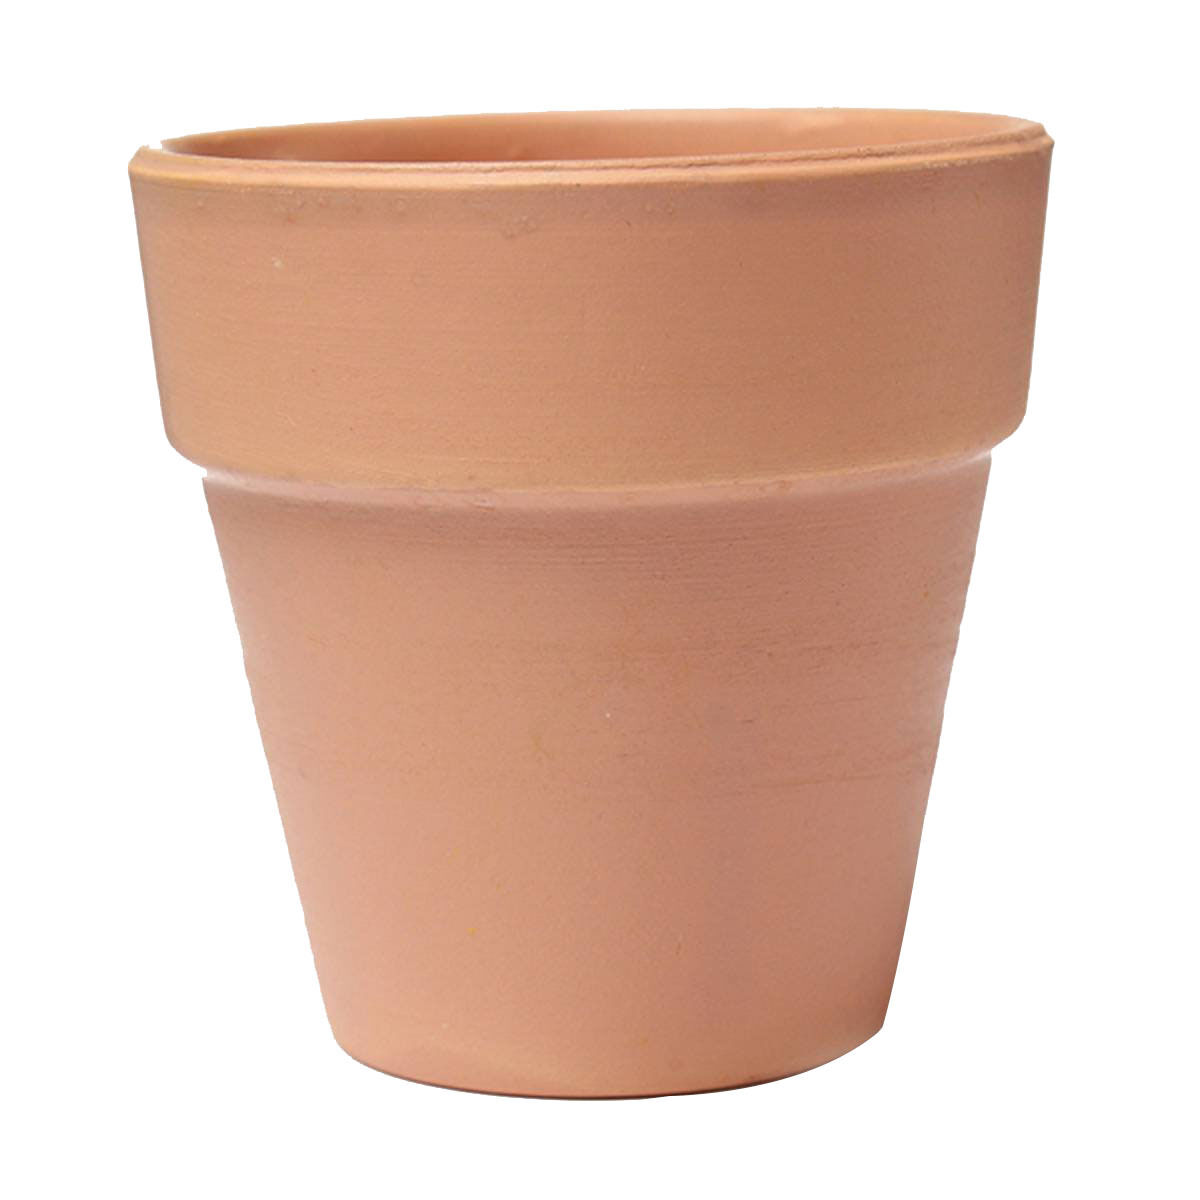 Terracotta Pot Clay Ceramic Pottery Planter Flower Pots W1l5 eBay